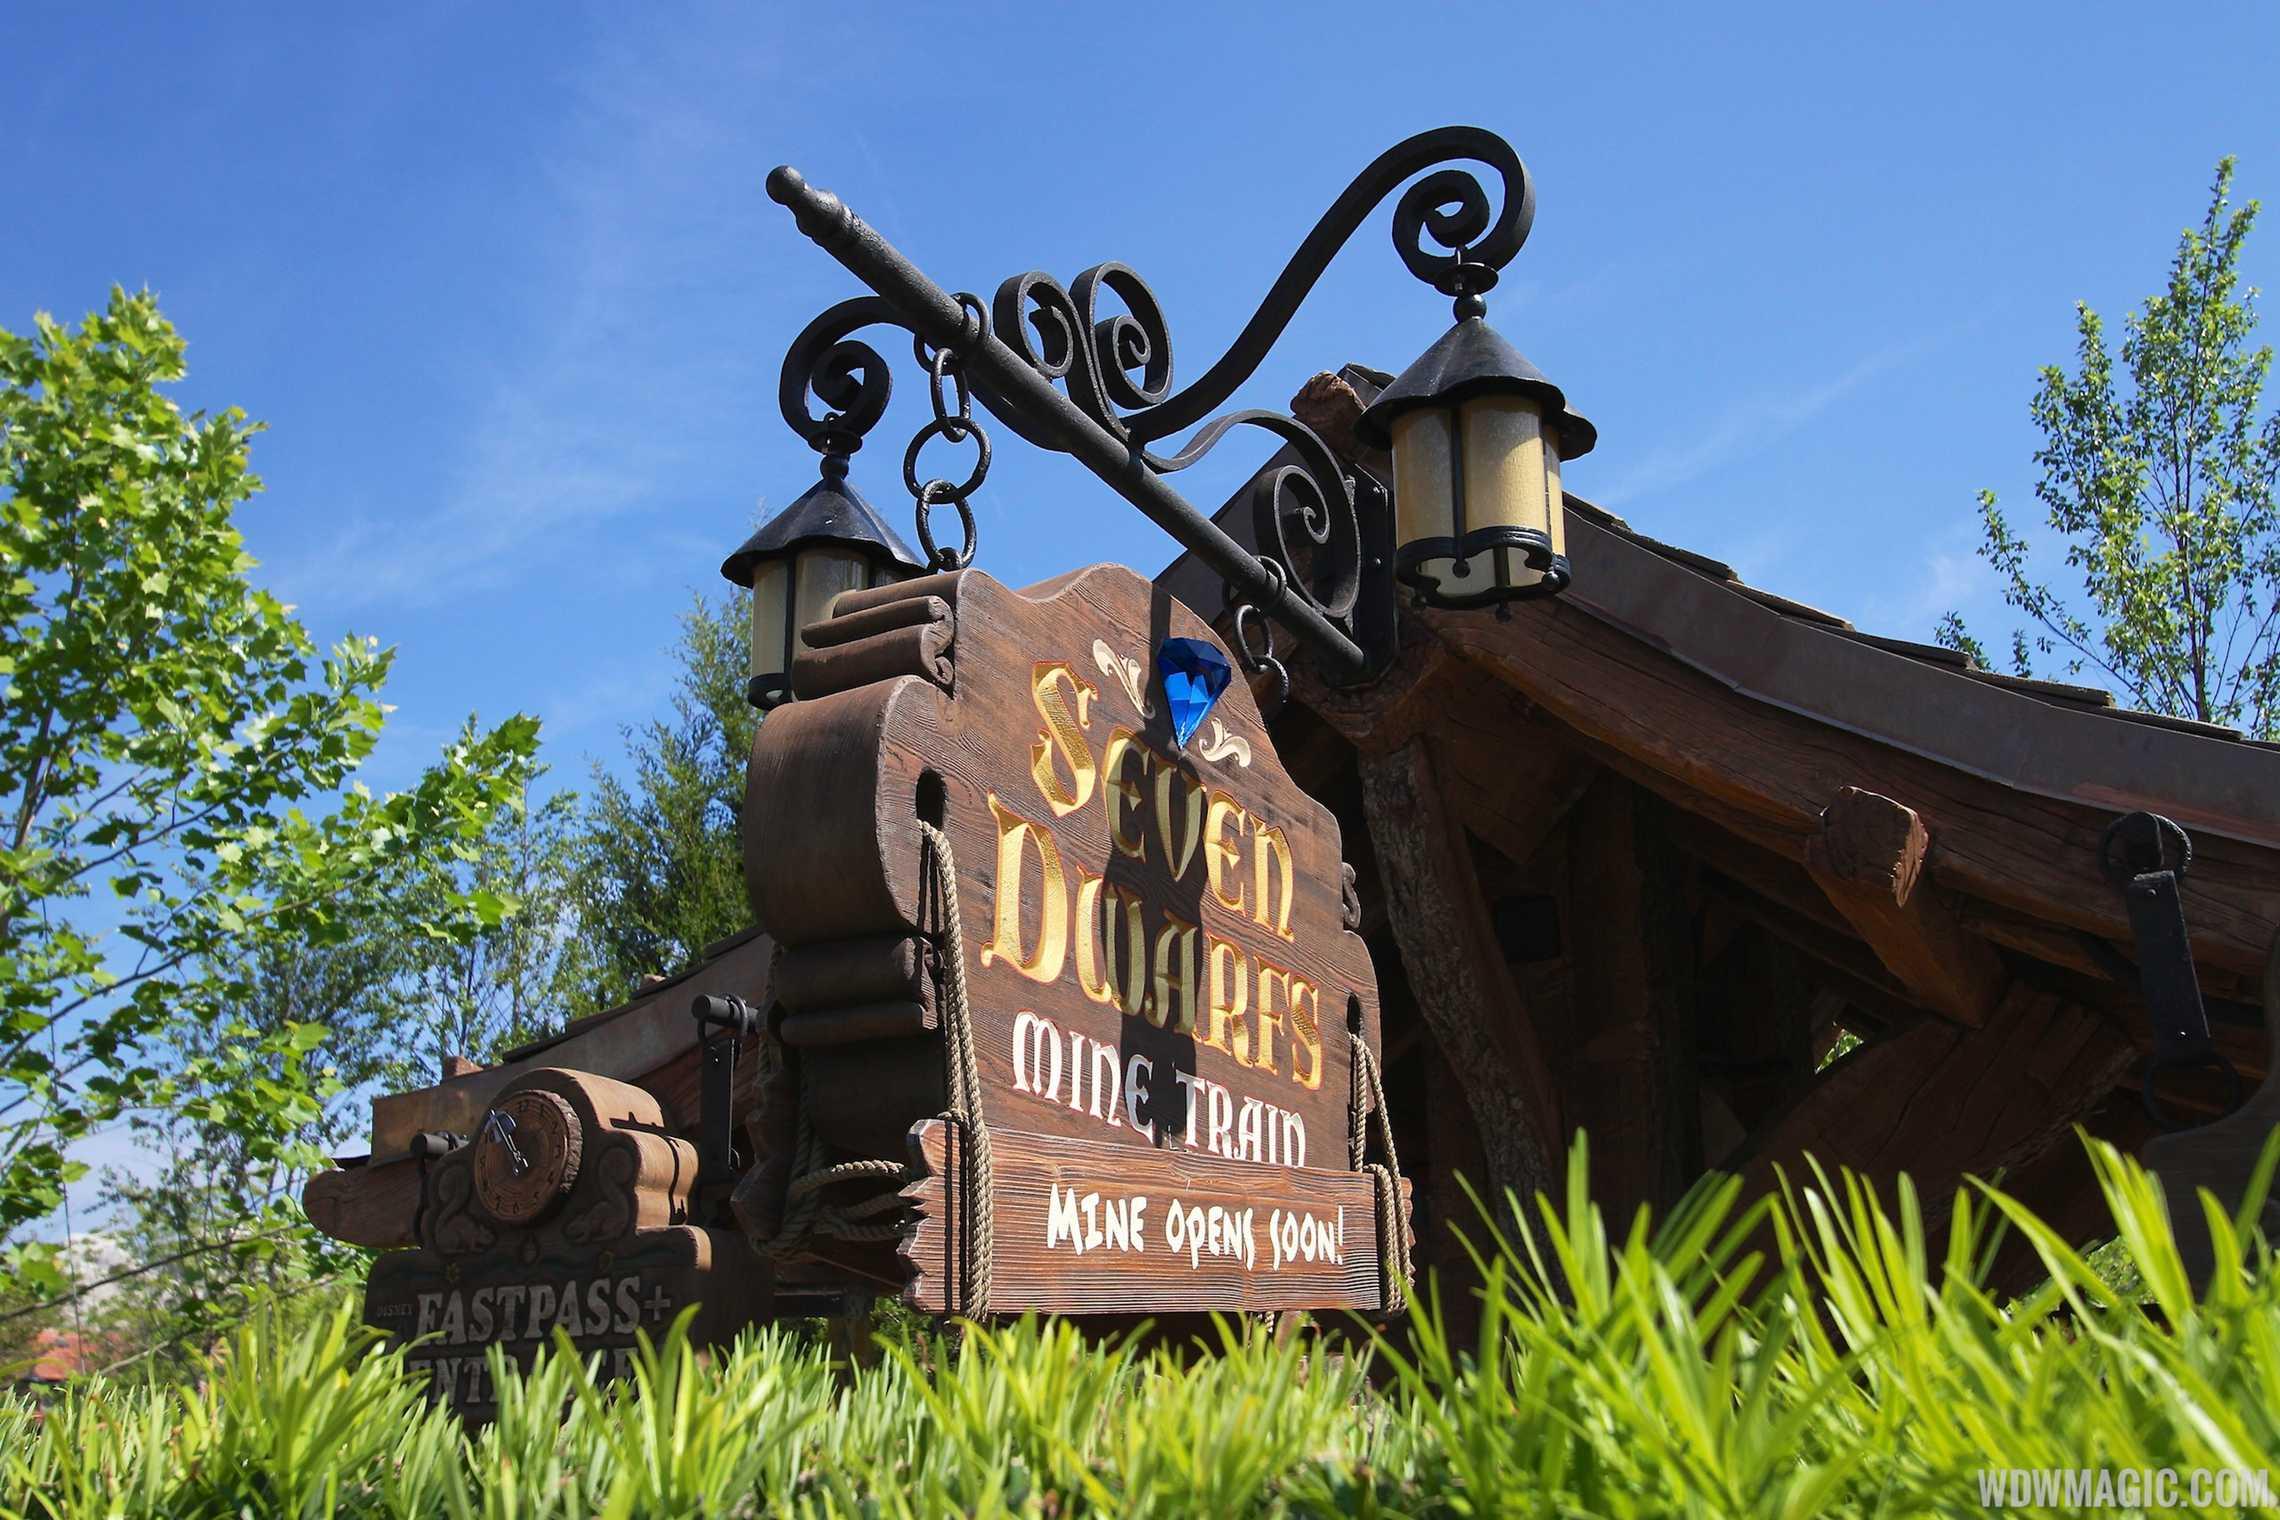 Seven Dwarfs Mine Train coaster